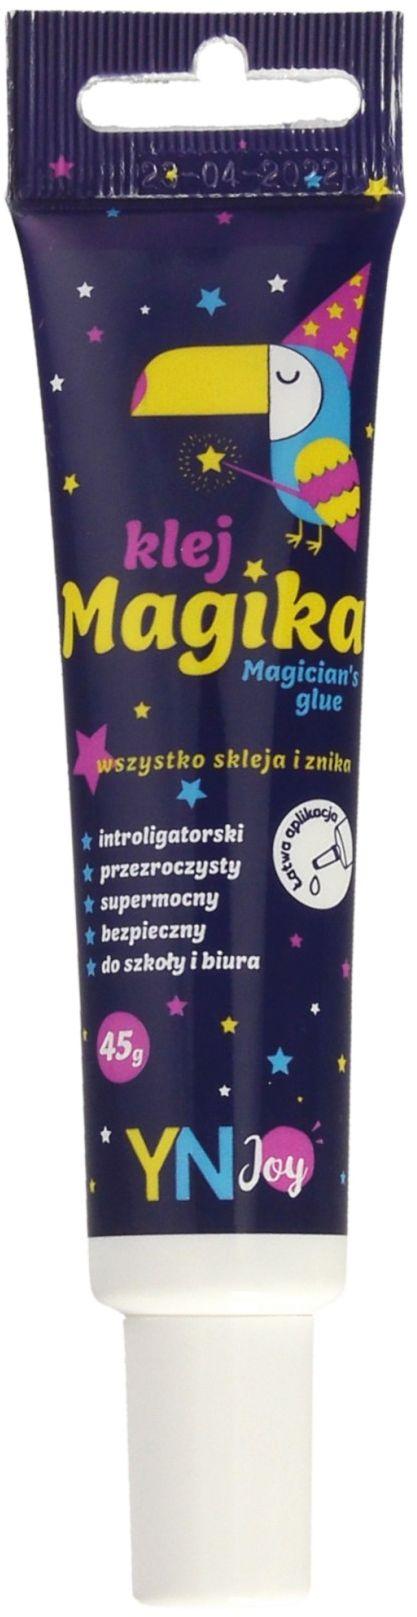 Klej magika 45g